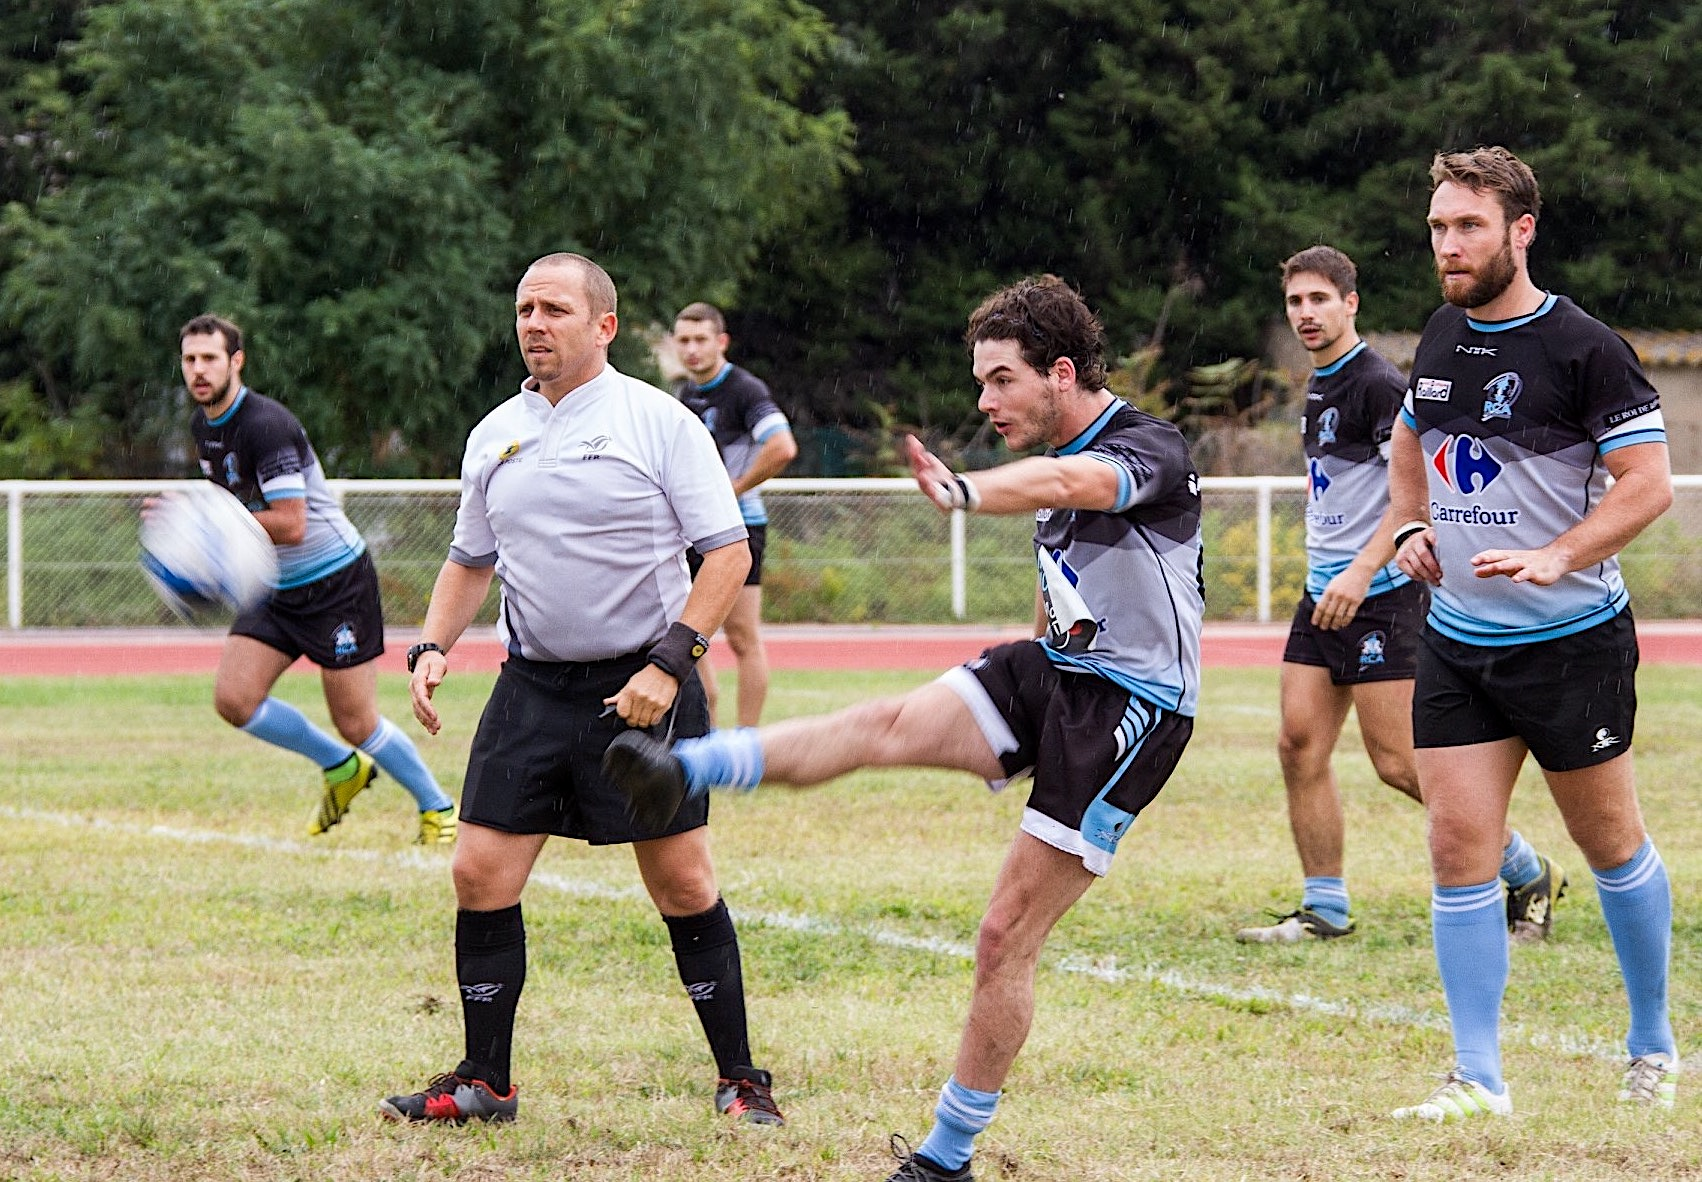 Rugby : Sortie victorieuse pour le RCA